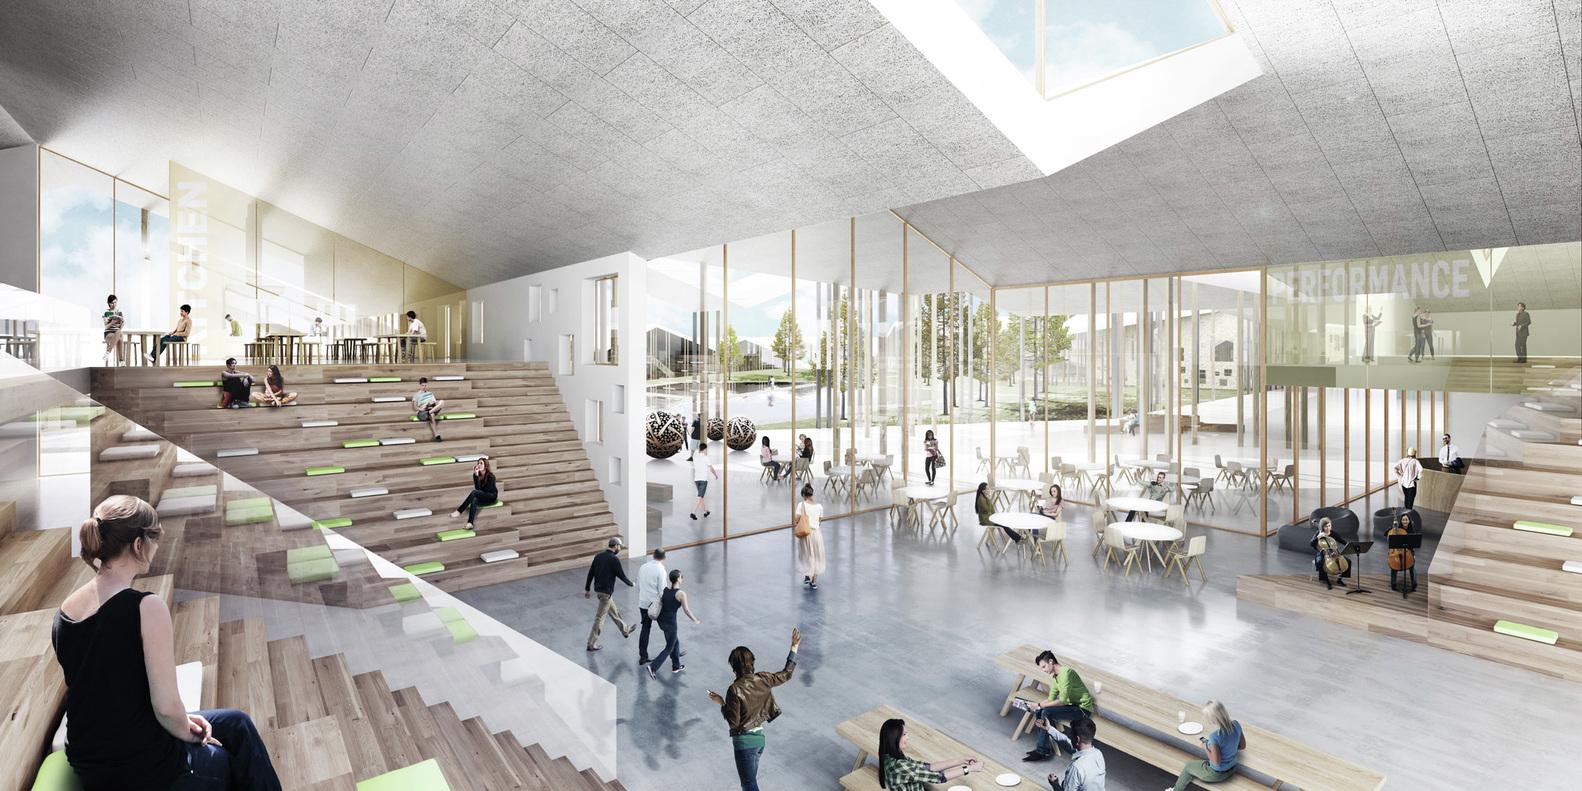 CEBRA Wins Competition To Design Smart School In RussiaCourtesy Of Architecture